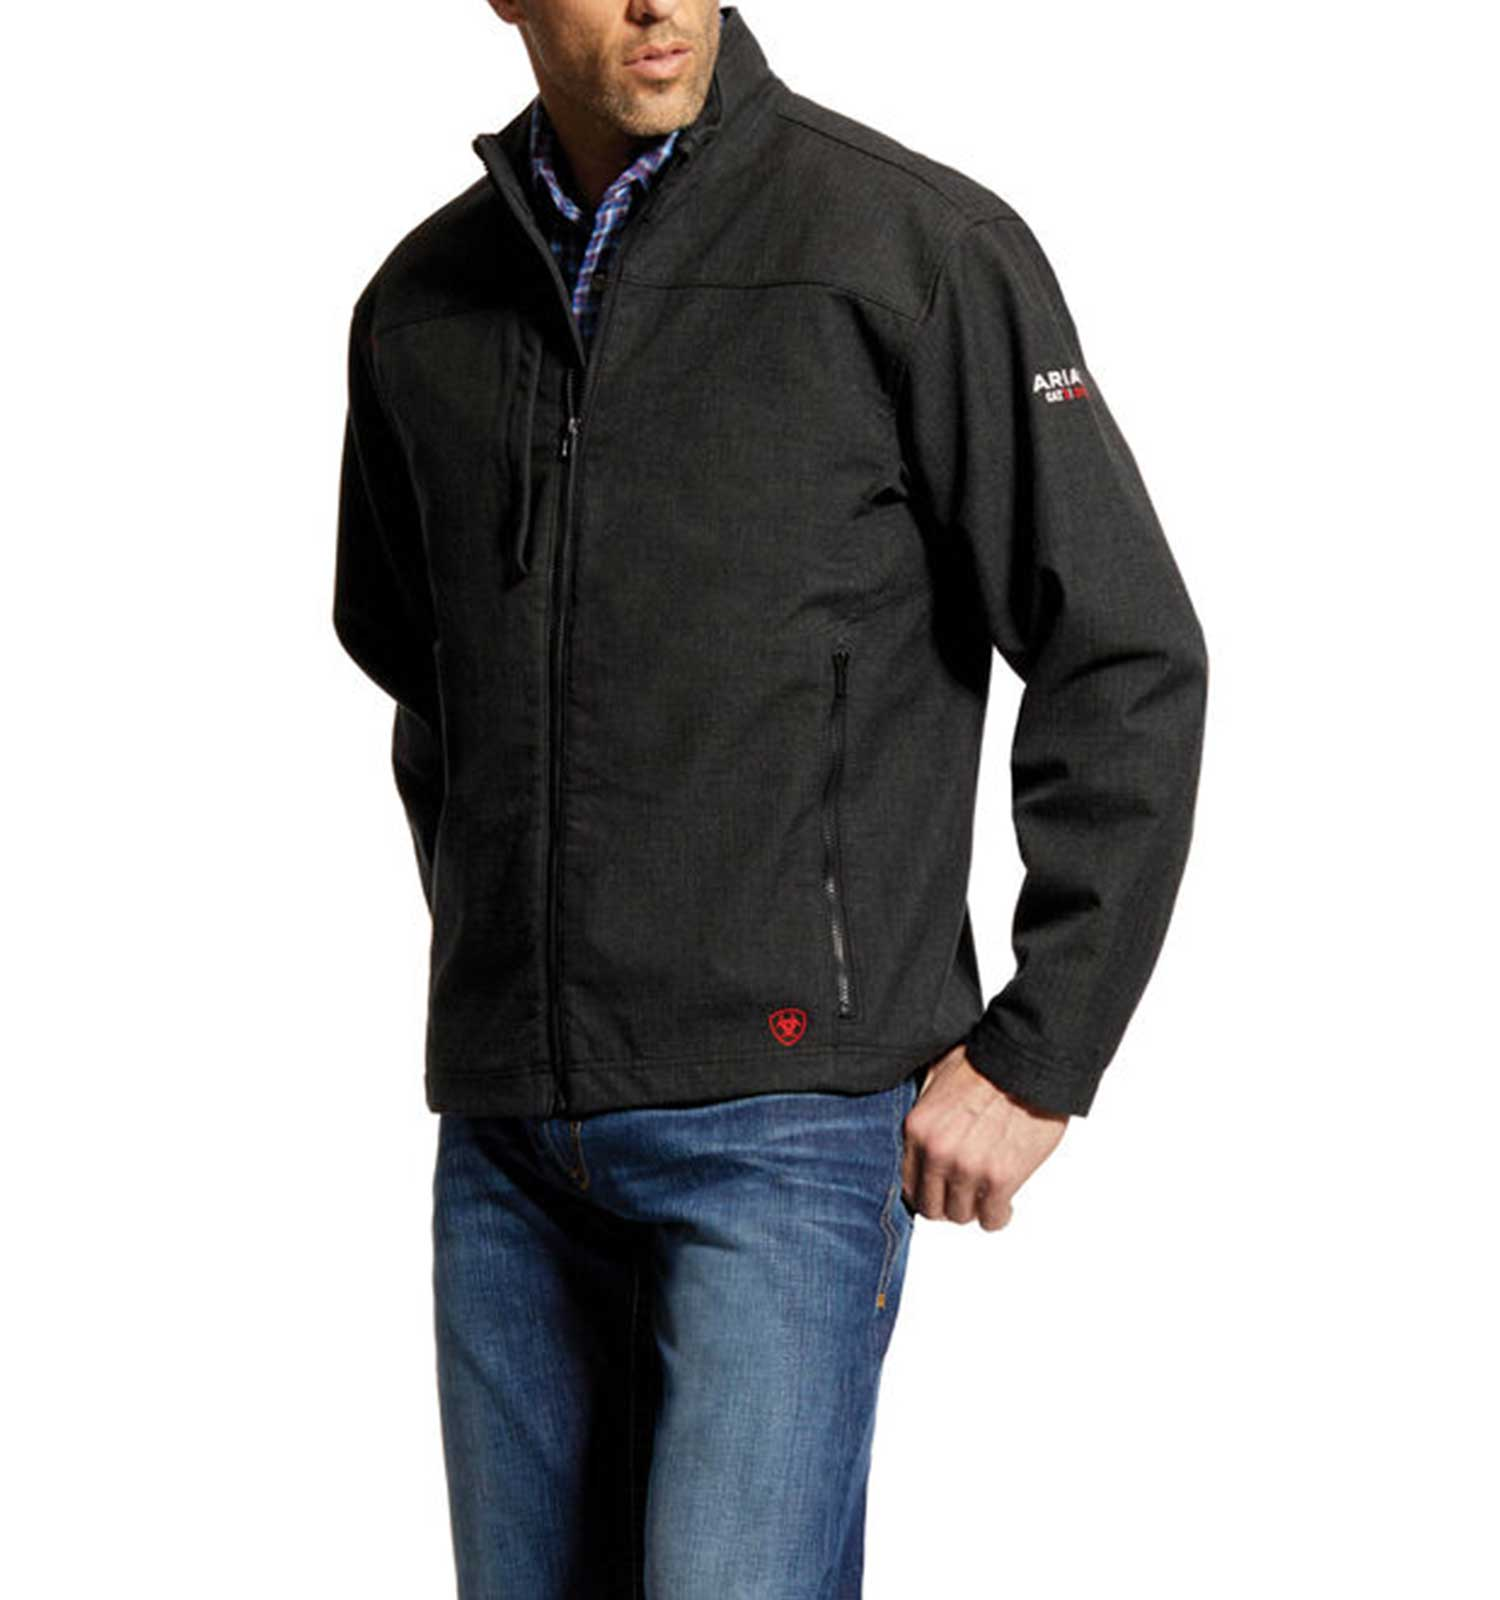 Ariat-FR-Vernon-Jacket-Black-Front